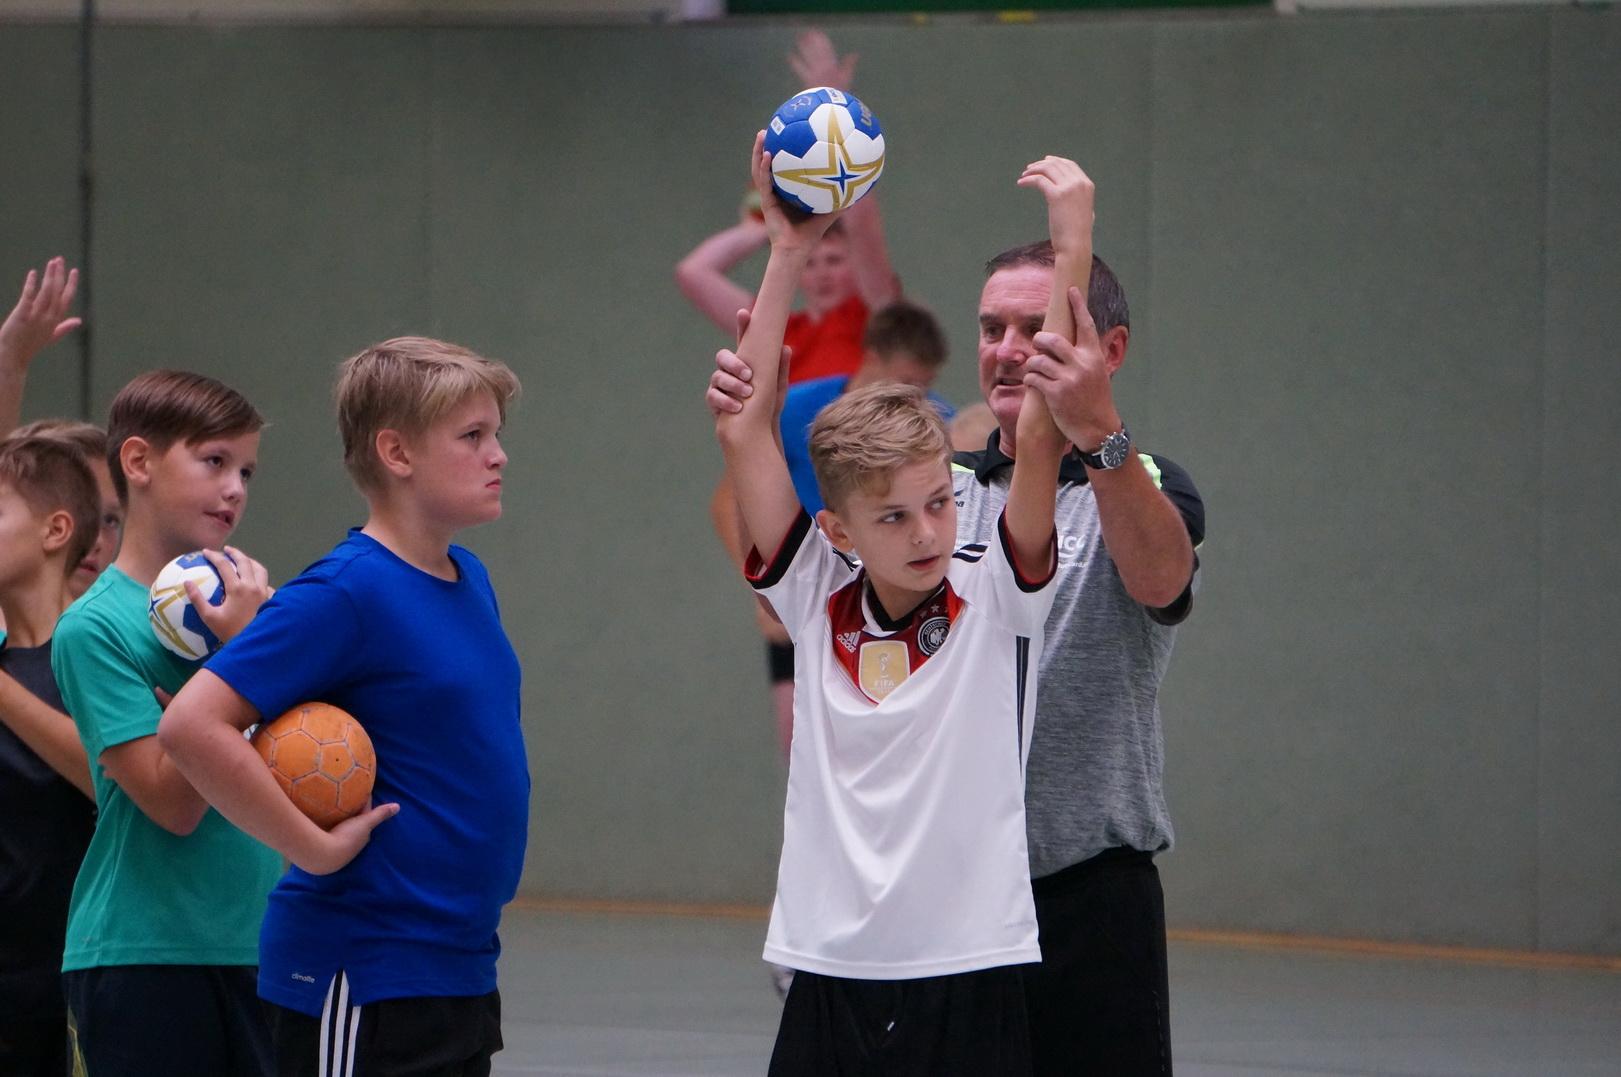 201808_Handballcamp_SDH_MG_076w